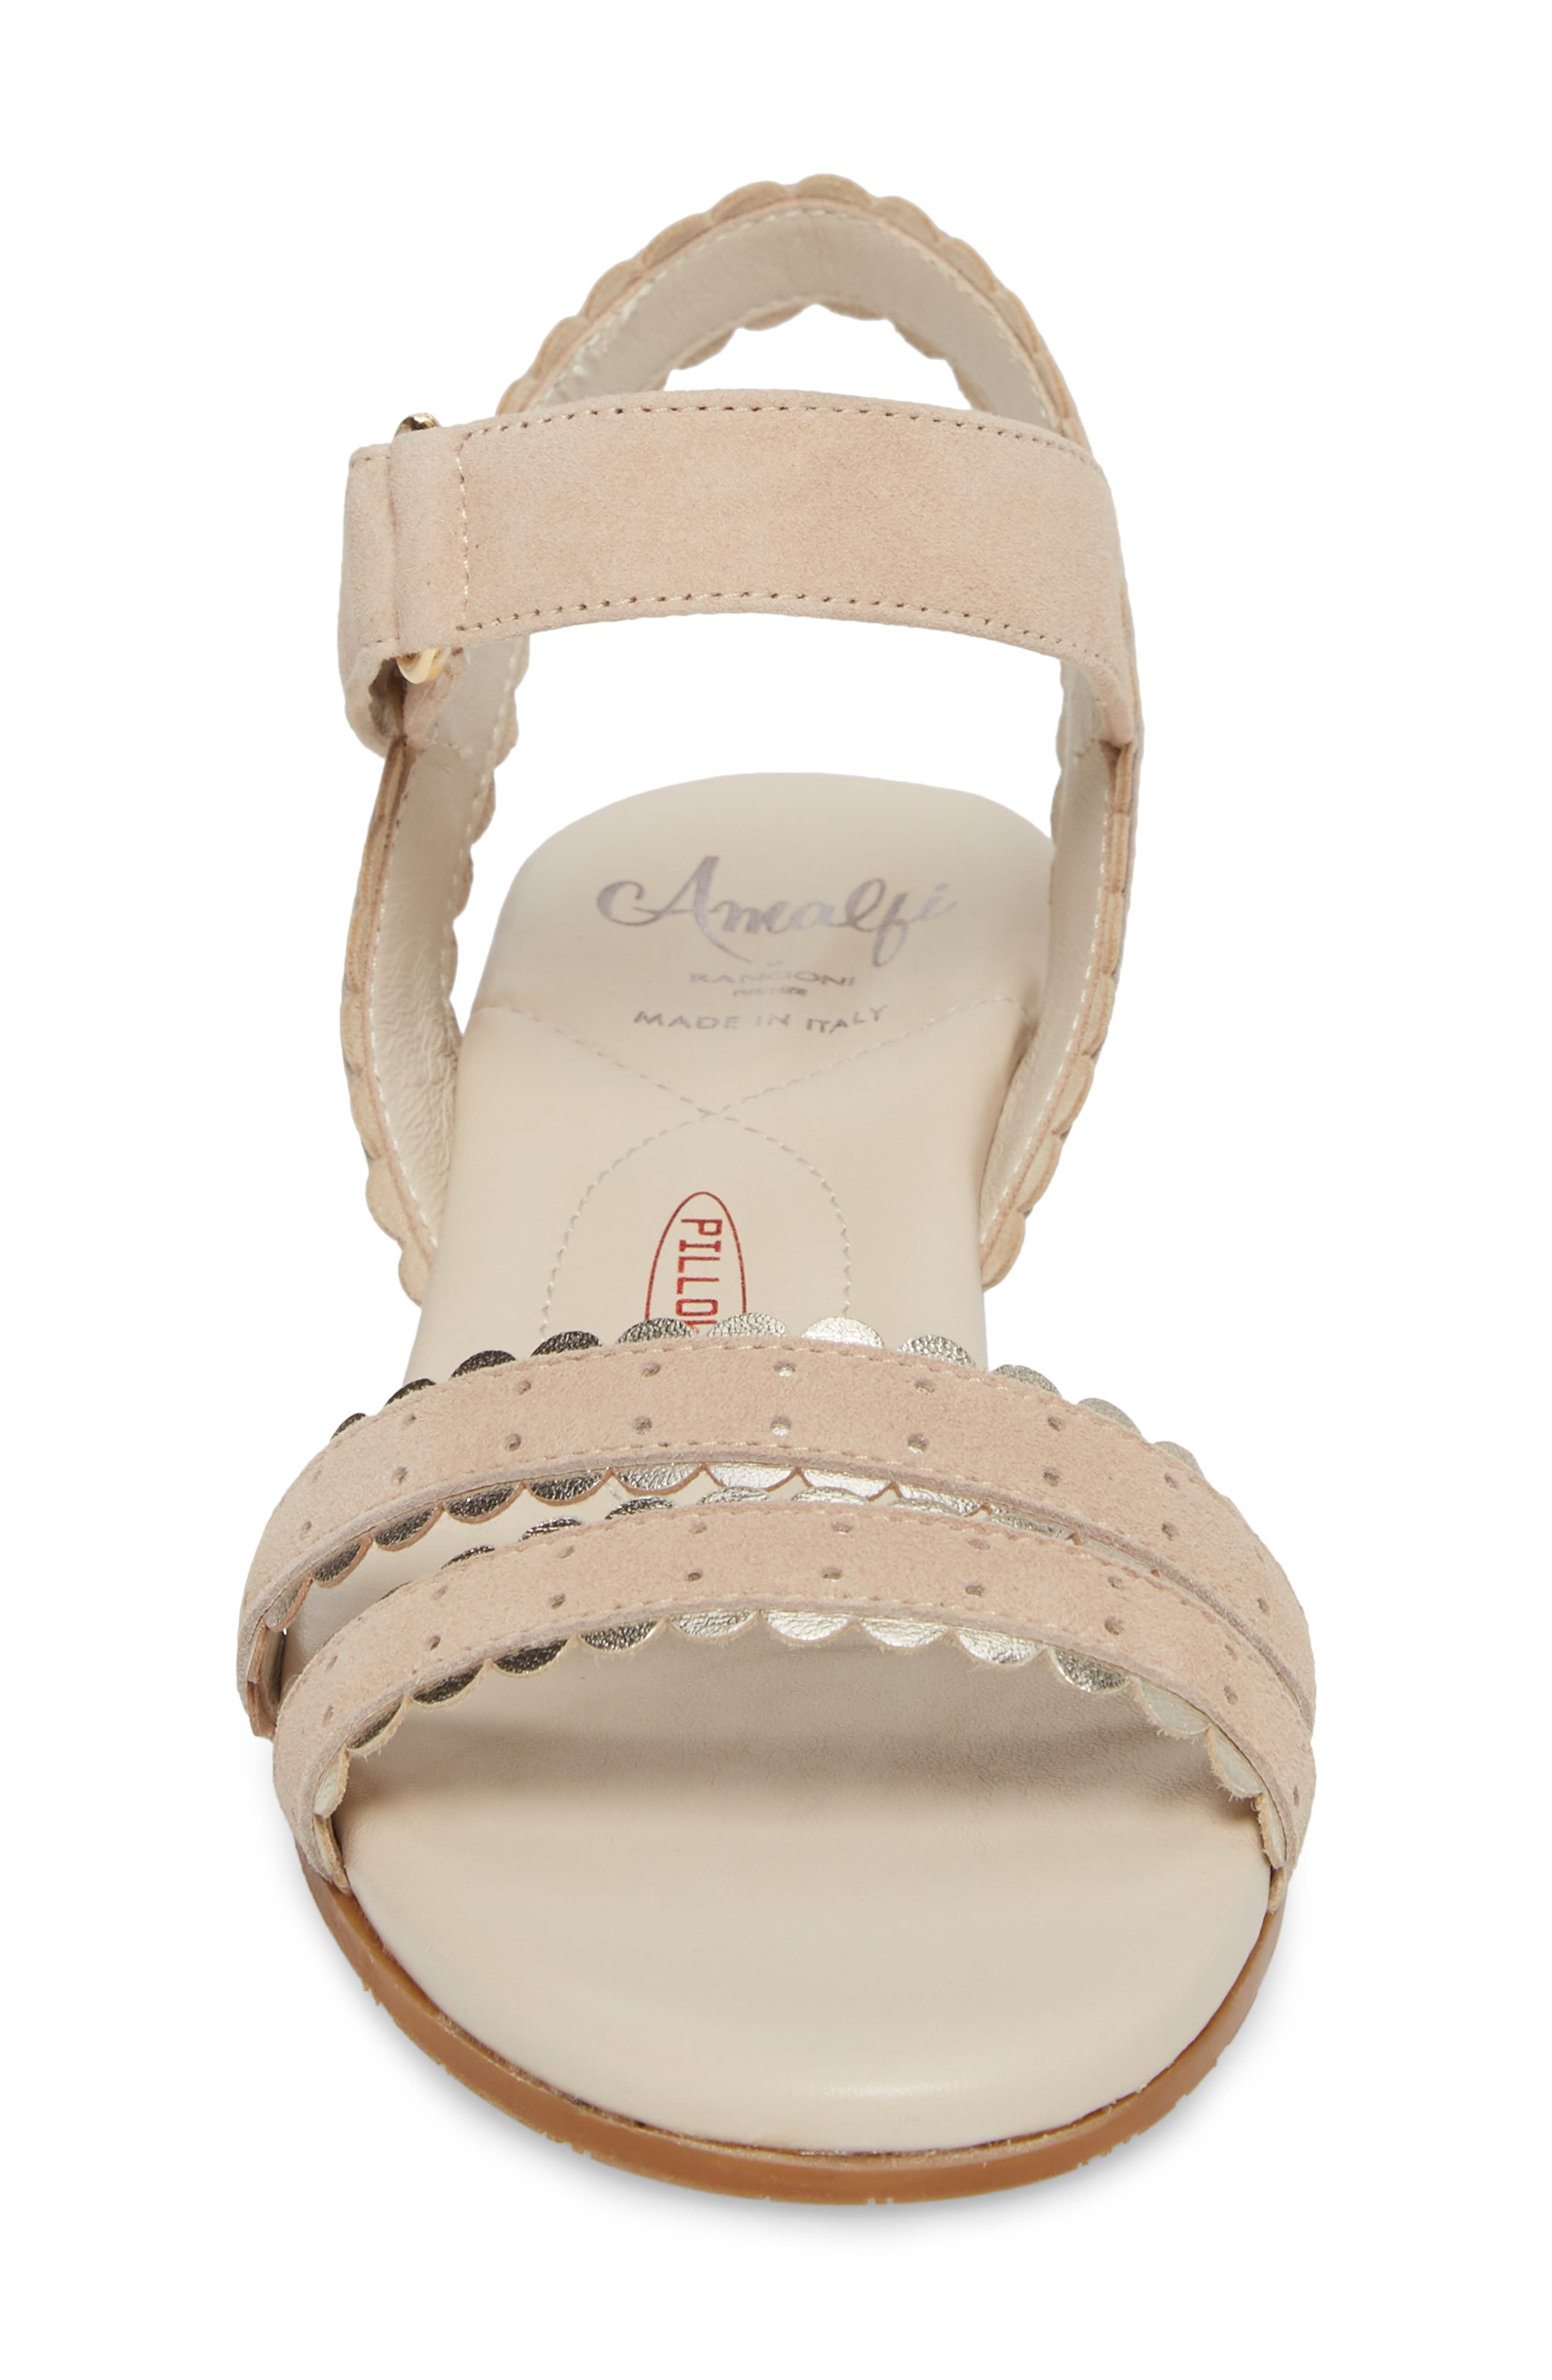 Messina Wedge Sandal,                             Alternate thumbnail 4, color,                             Cream/ Platinum Suede